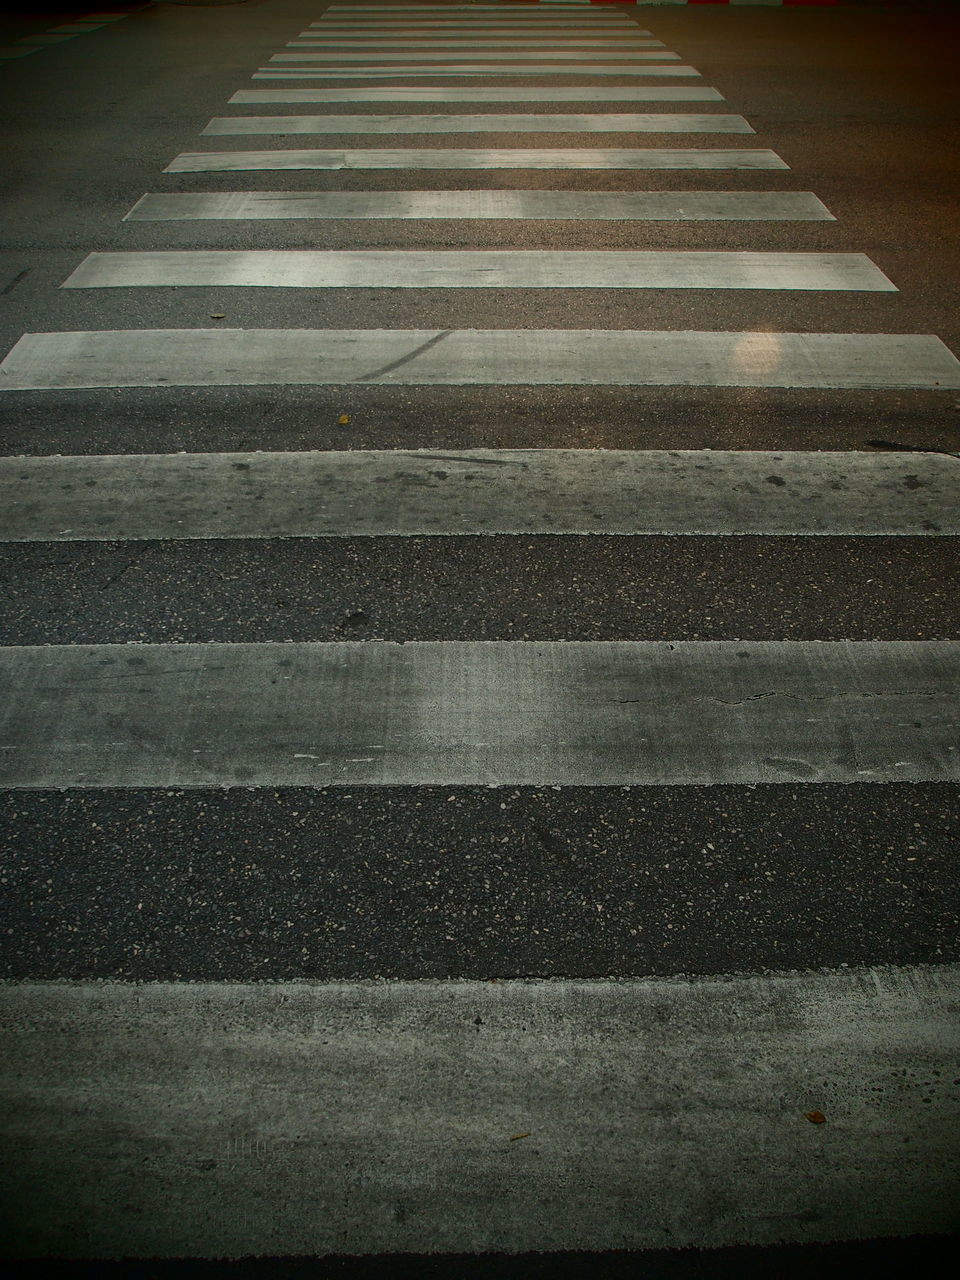 zebra crossing, road marking, striped, transportation, asphalt, road, white line, outdoors, day, backgrounds, no people, line, city, nature